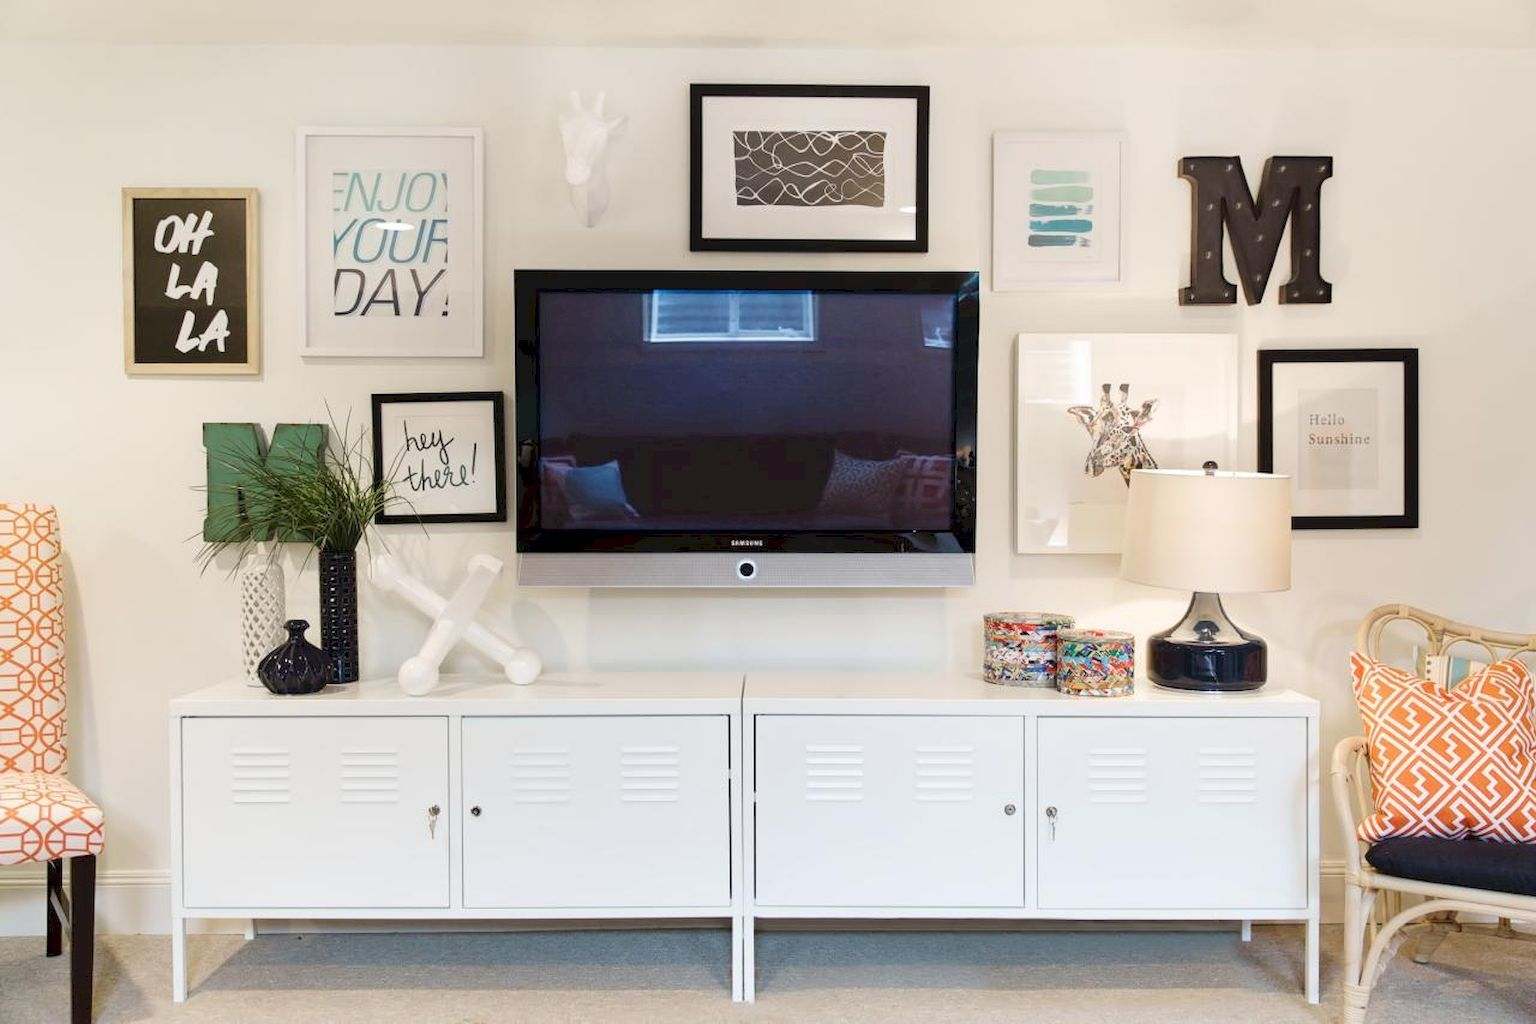 60 Tv Wall Living Room Ideas Decor On A Budget Living Room Wall Living Room Tv Wall Decor Around Tv